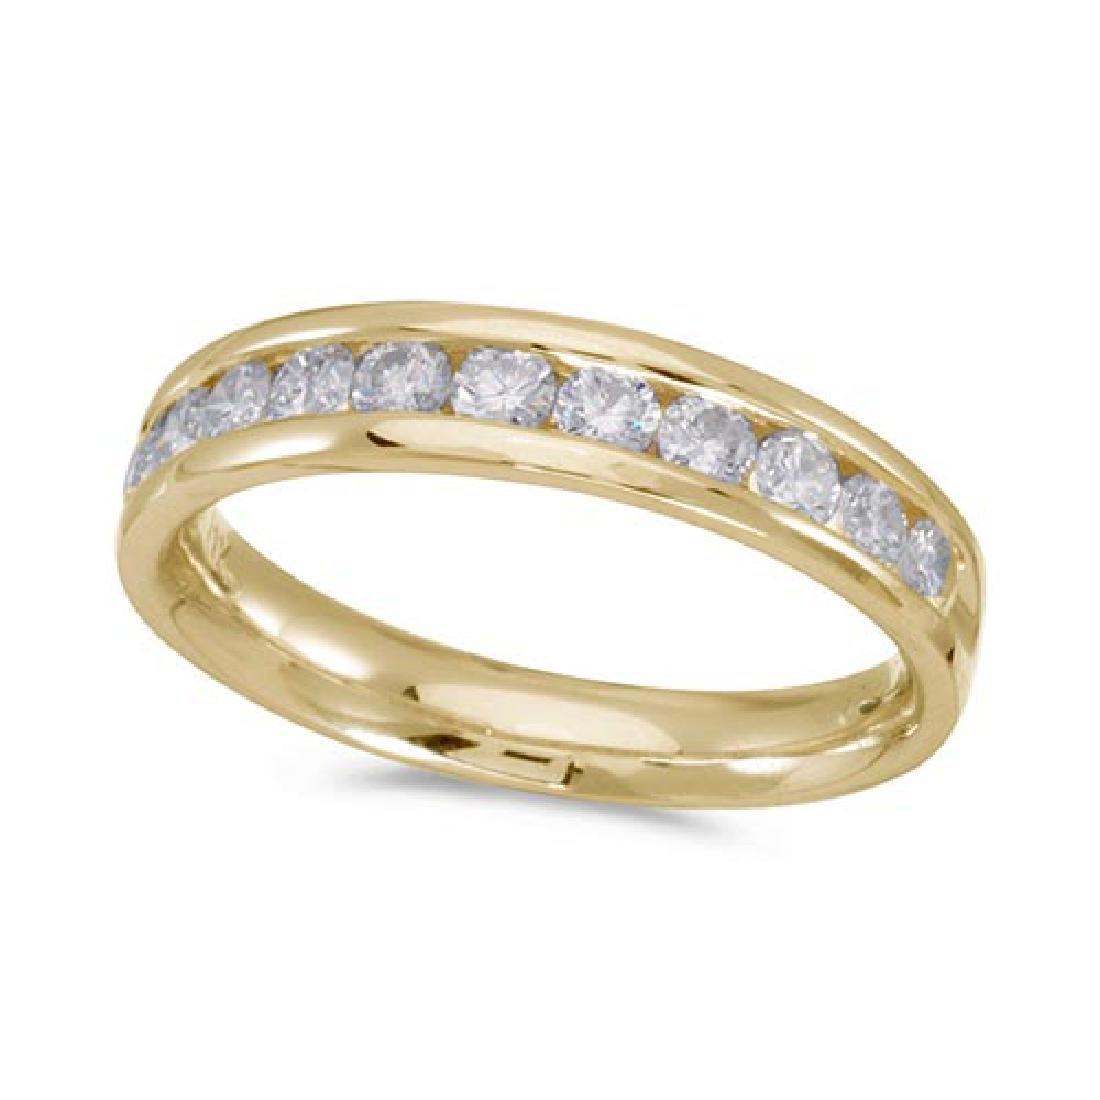 Certified 14K Yellow Gold Diamond Diamond Band Ring